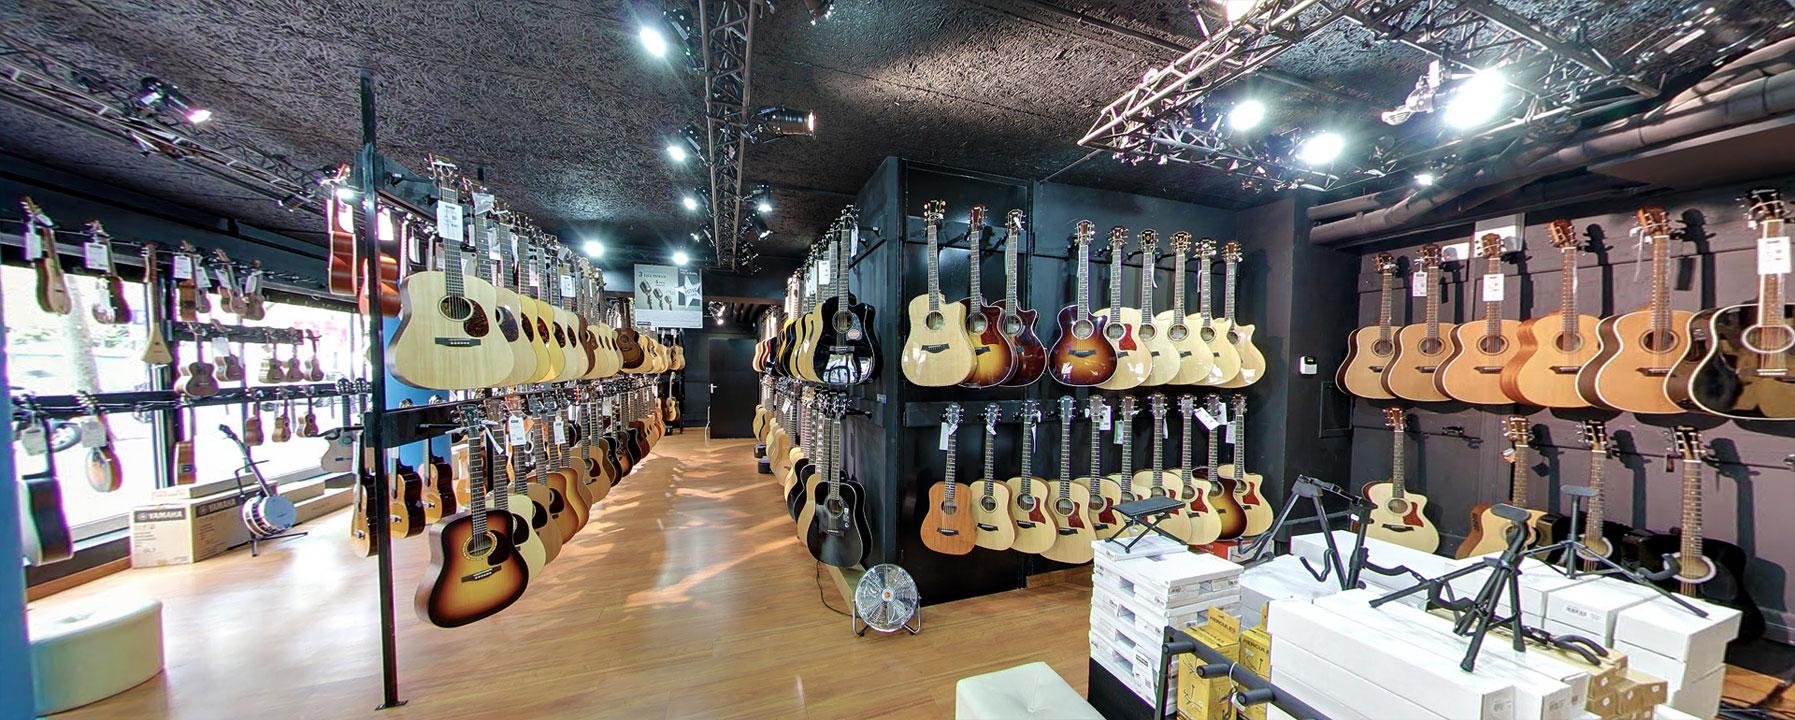 Avis Woodbrass - magasin de musique à Paris - Audiofanzine